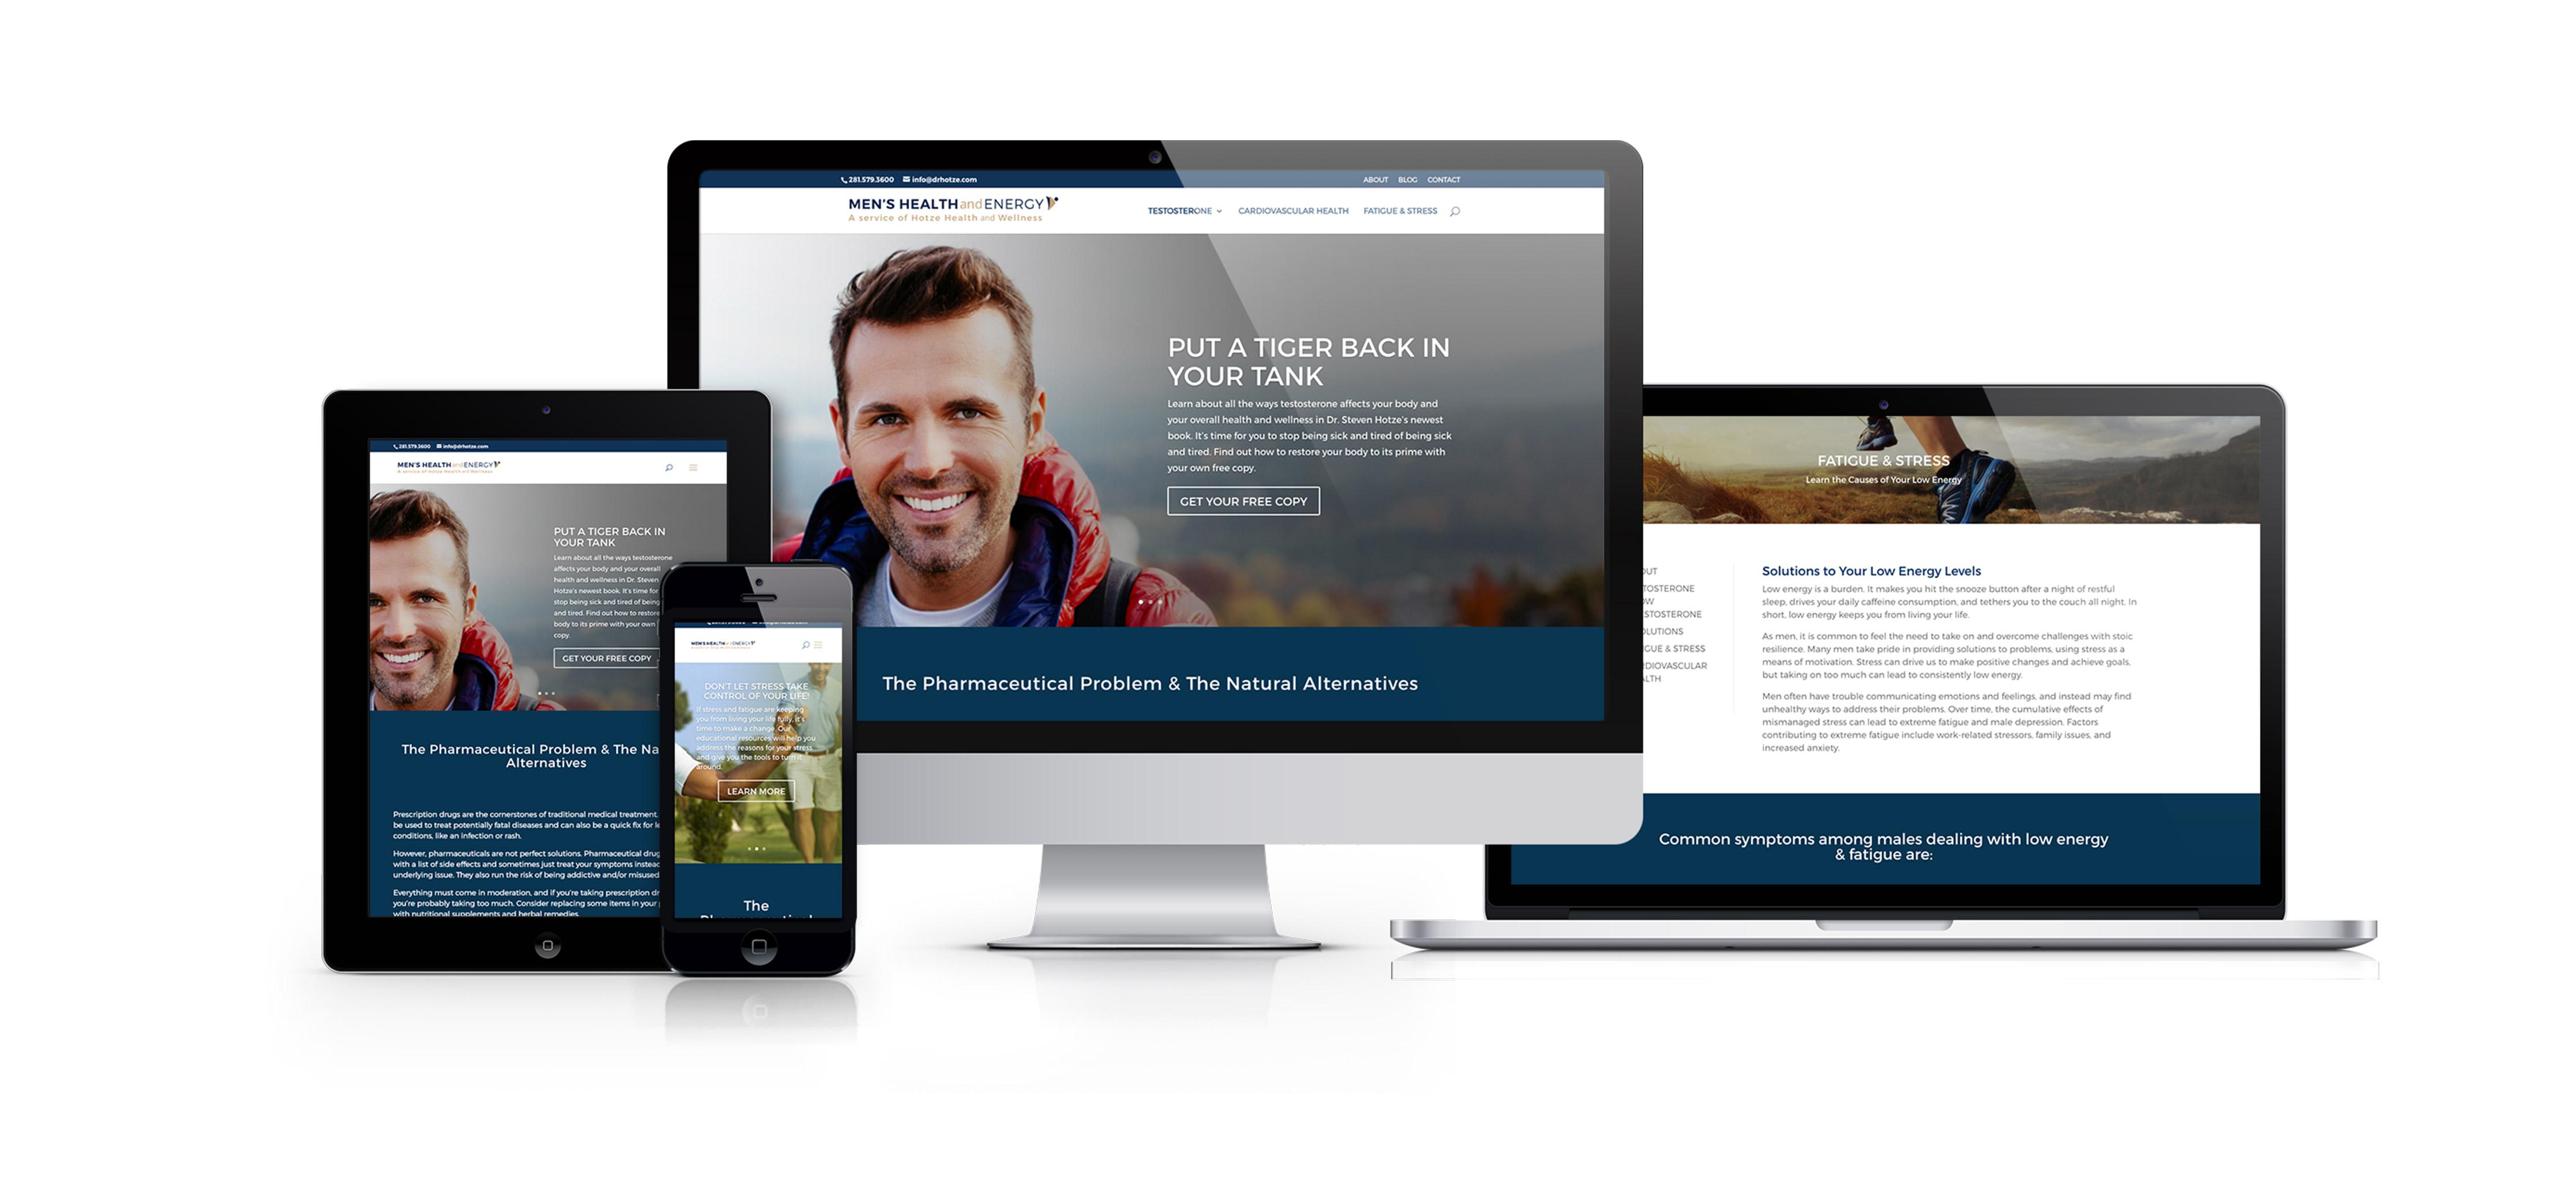 Mens Health & Wellness.org Responsive Website